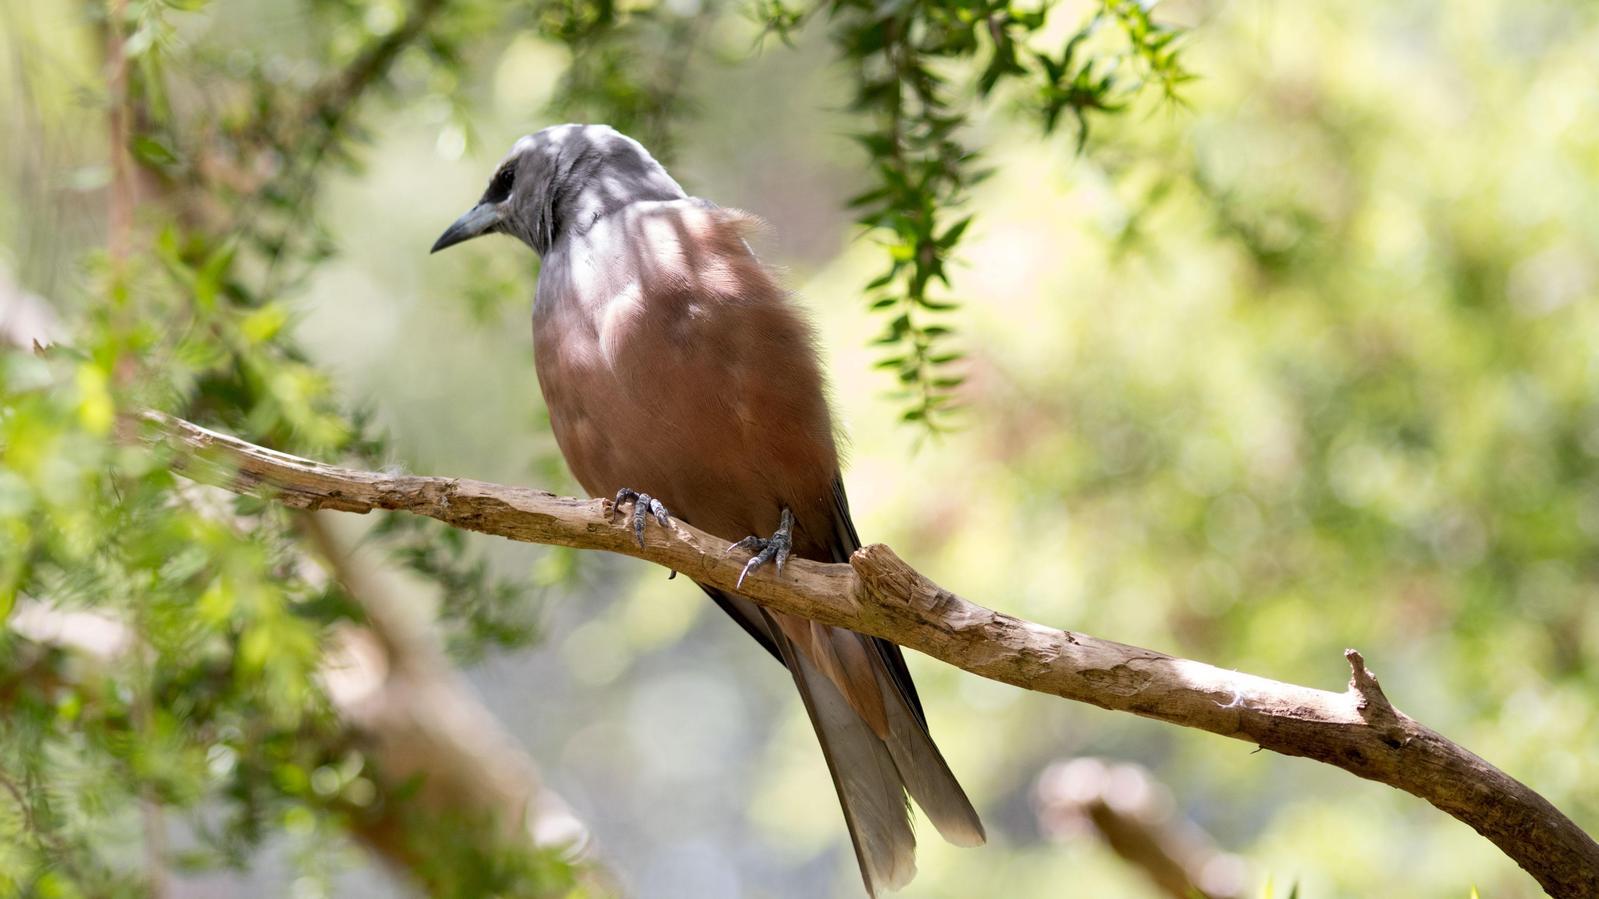 Dusky Woodswallow Photo by Richard Lund